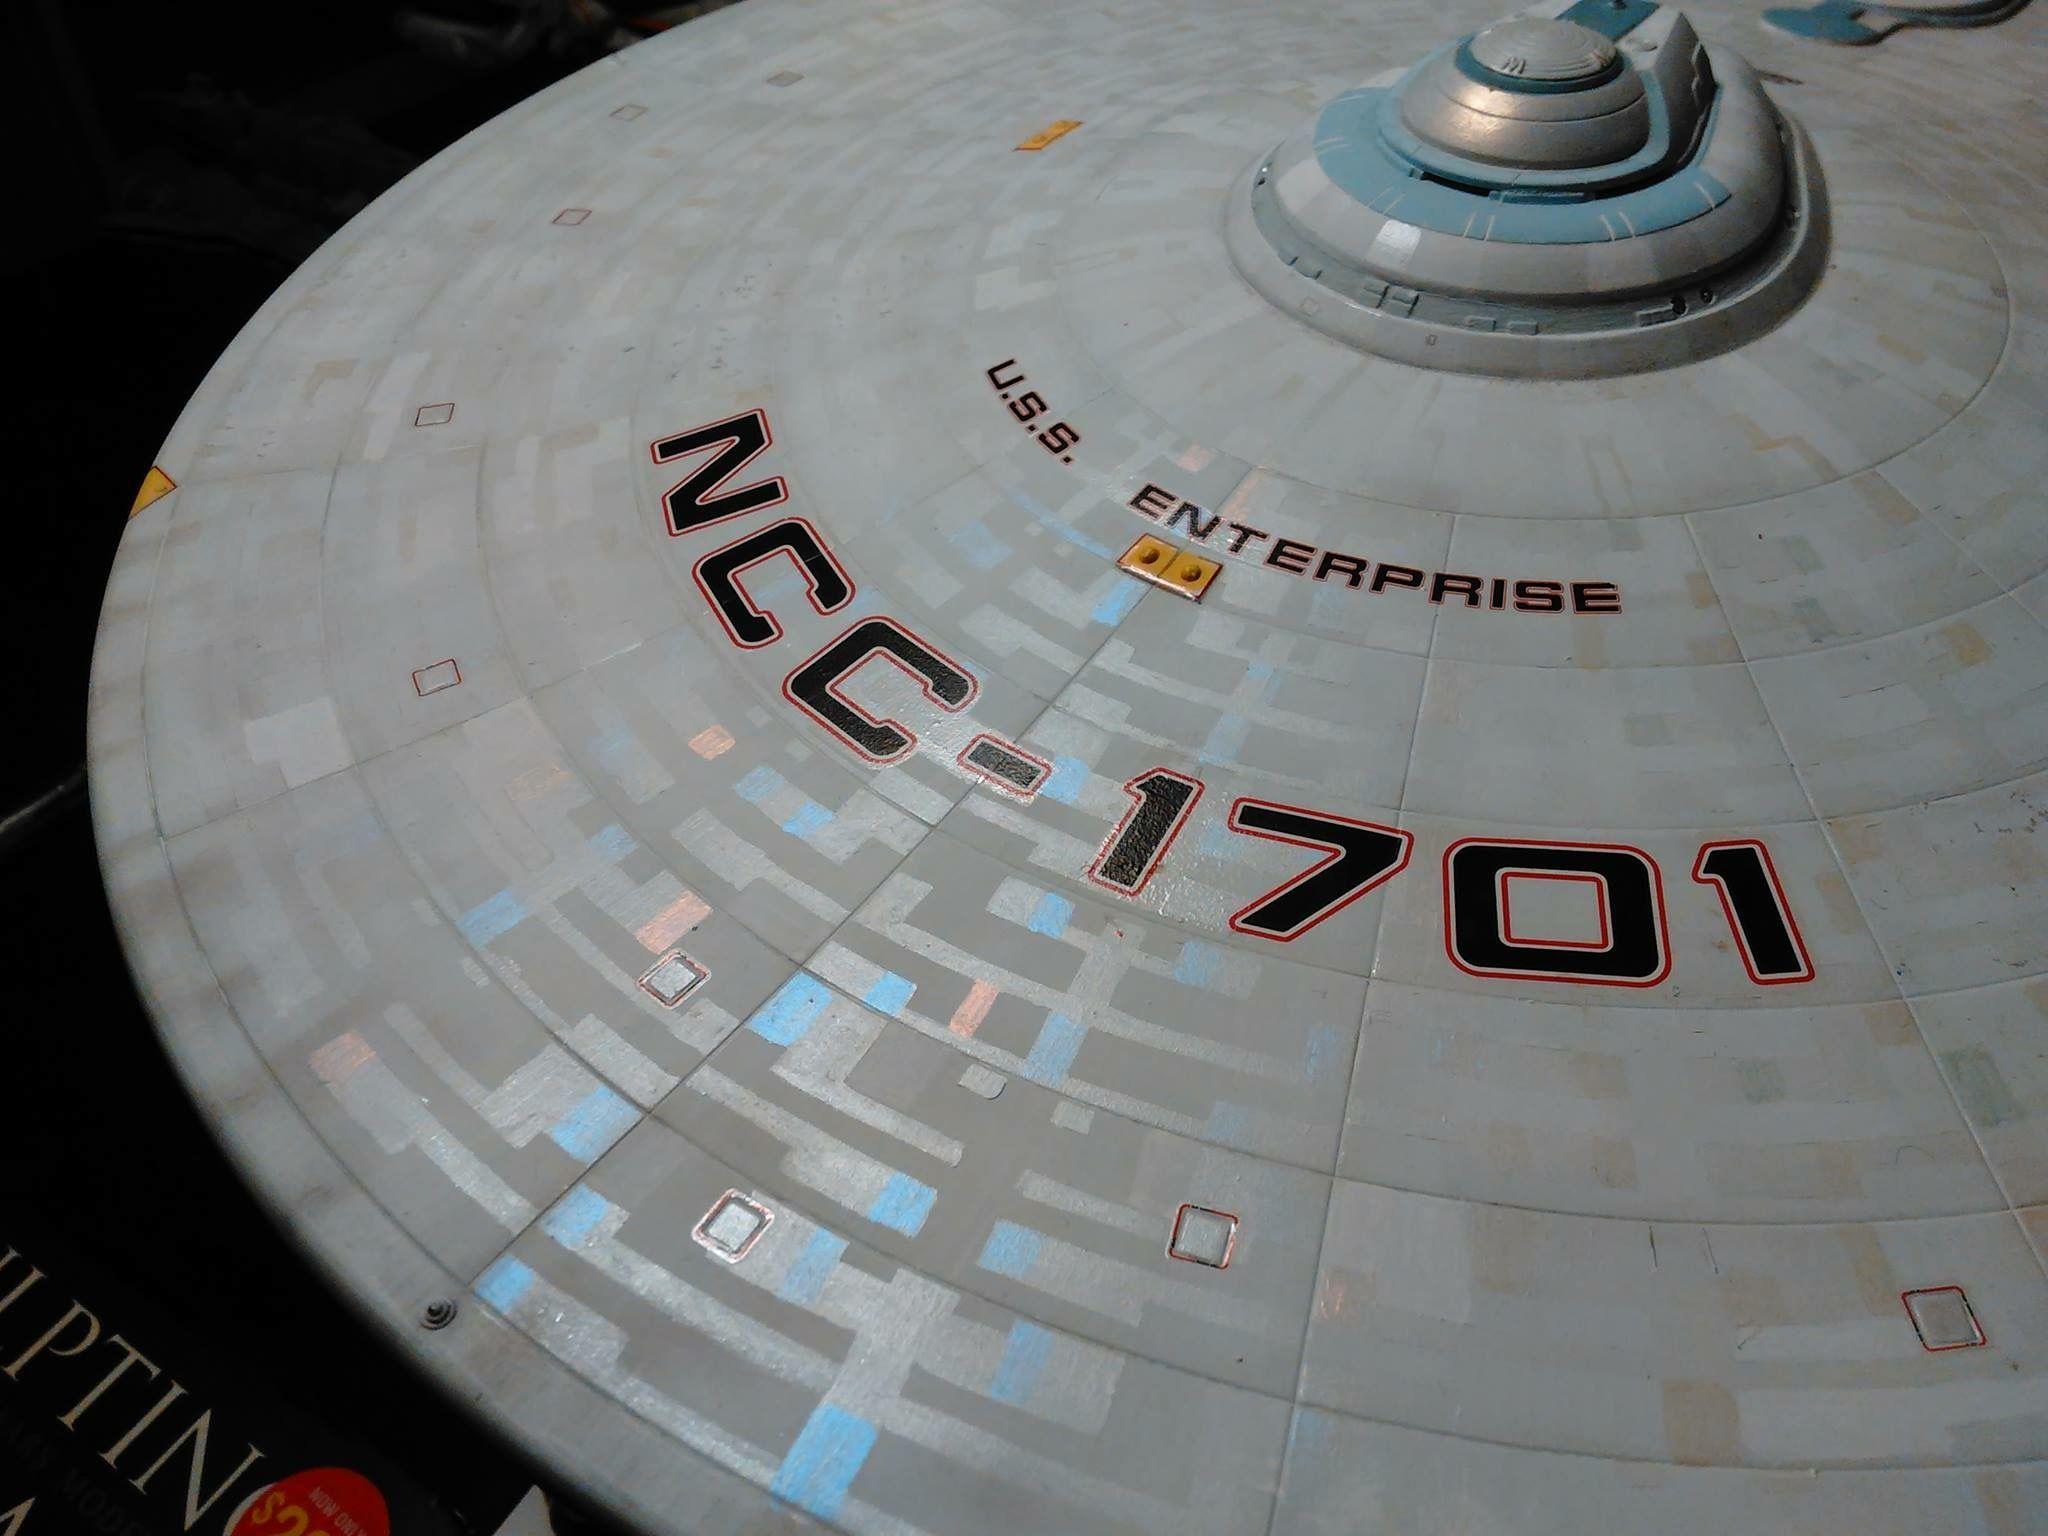 Star trek uss enterprise ncc refit 1 scale model - 1 350 Scale Polar Lights Uss Enterprise Refit Model Aztecing Example